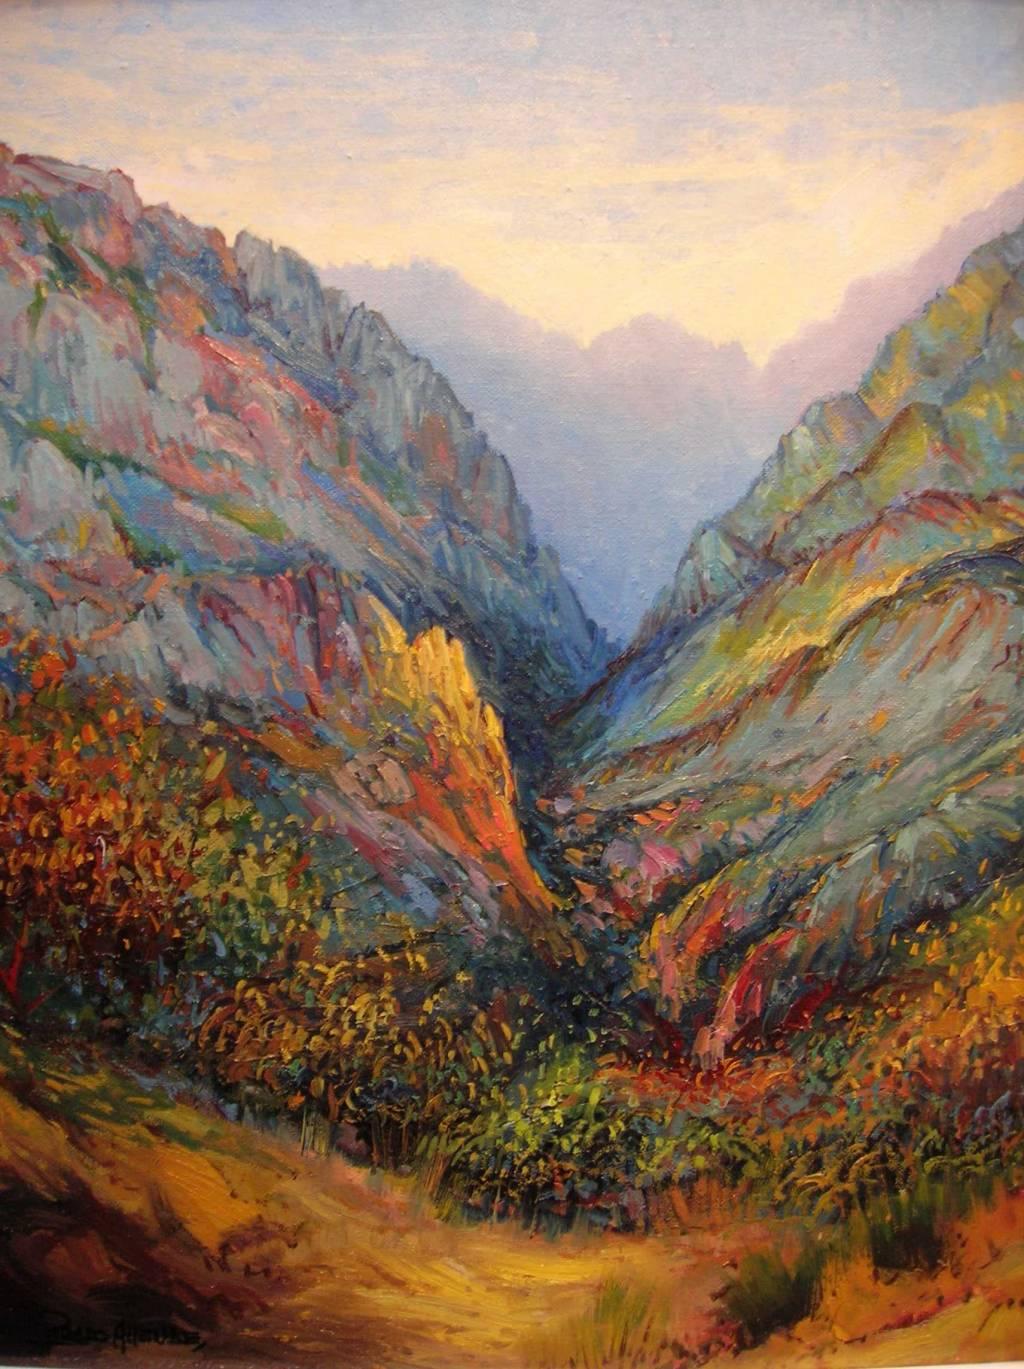 Picos de europa c lido est o de oto o 19 luis prado - Pintores en asturias ...